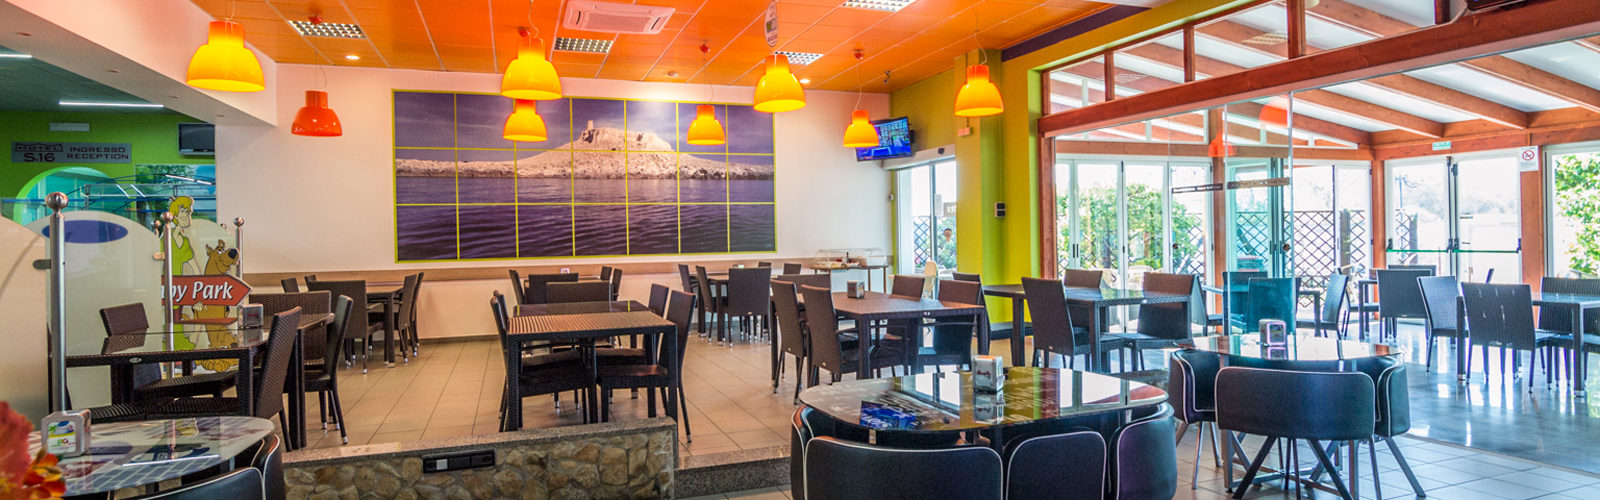 apulia station dating Restaurants around apulia station - apulia station, ny - aarp in your.